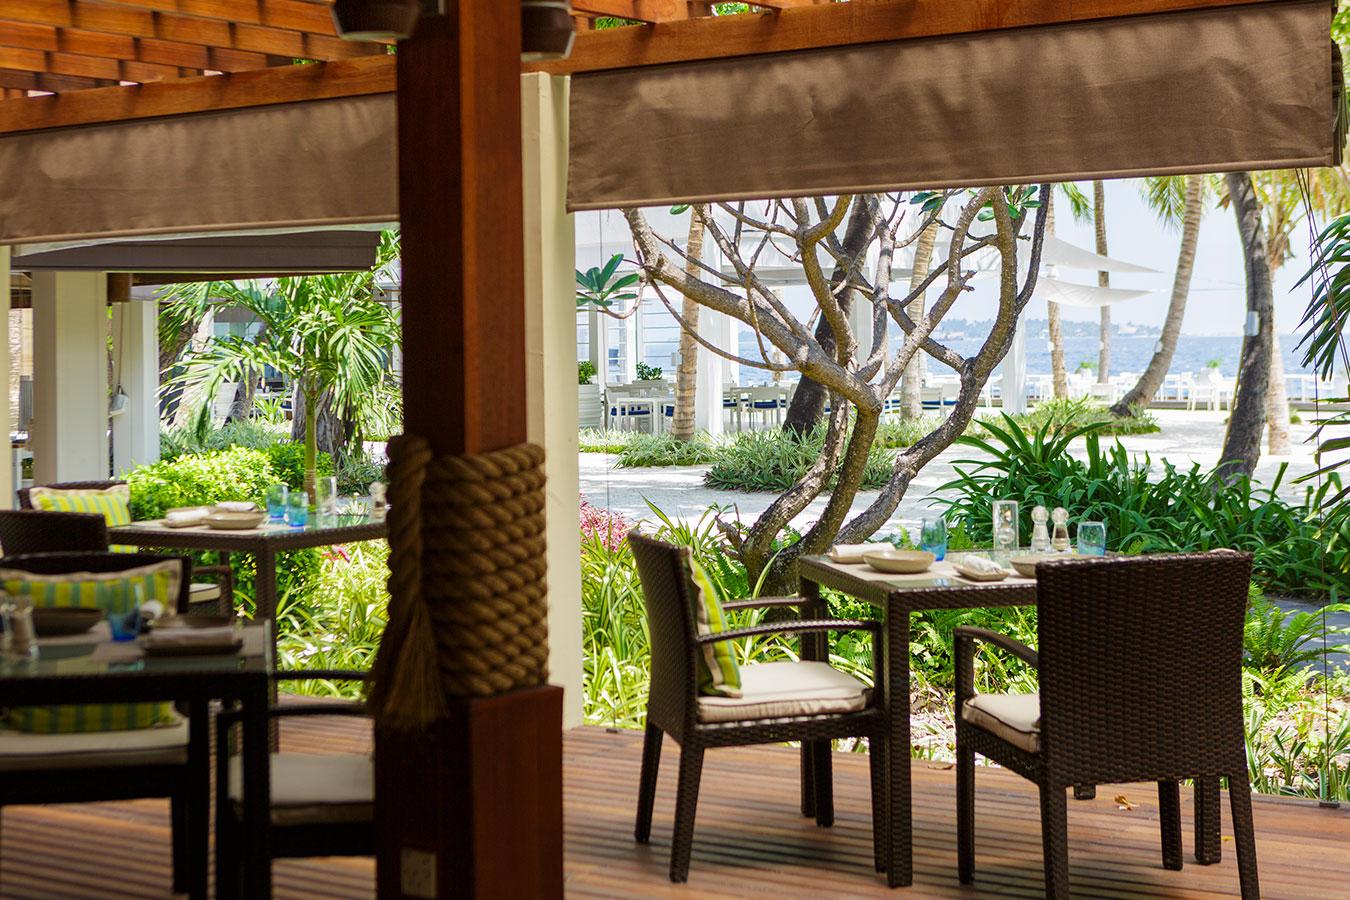 Kurumba Maldives - Cafe image - Maldives Resorts